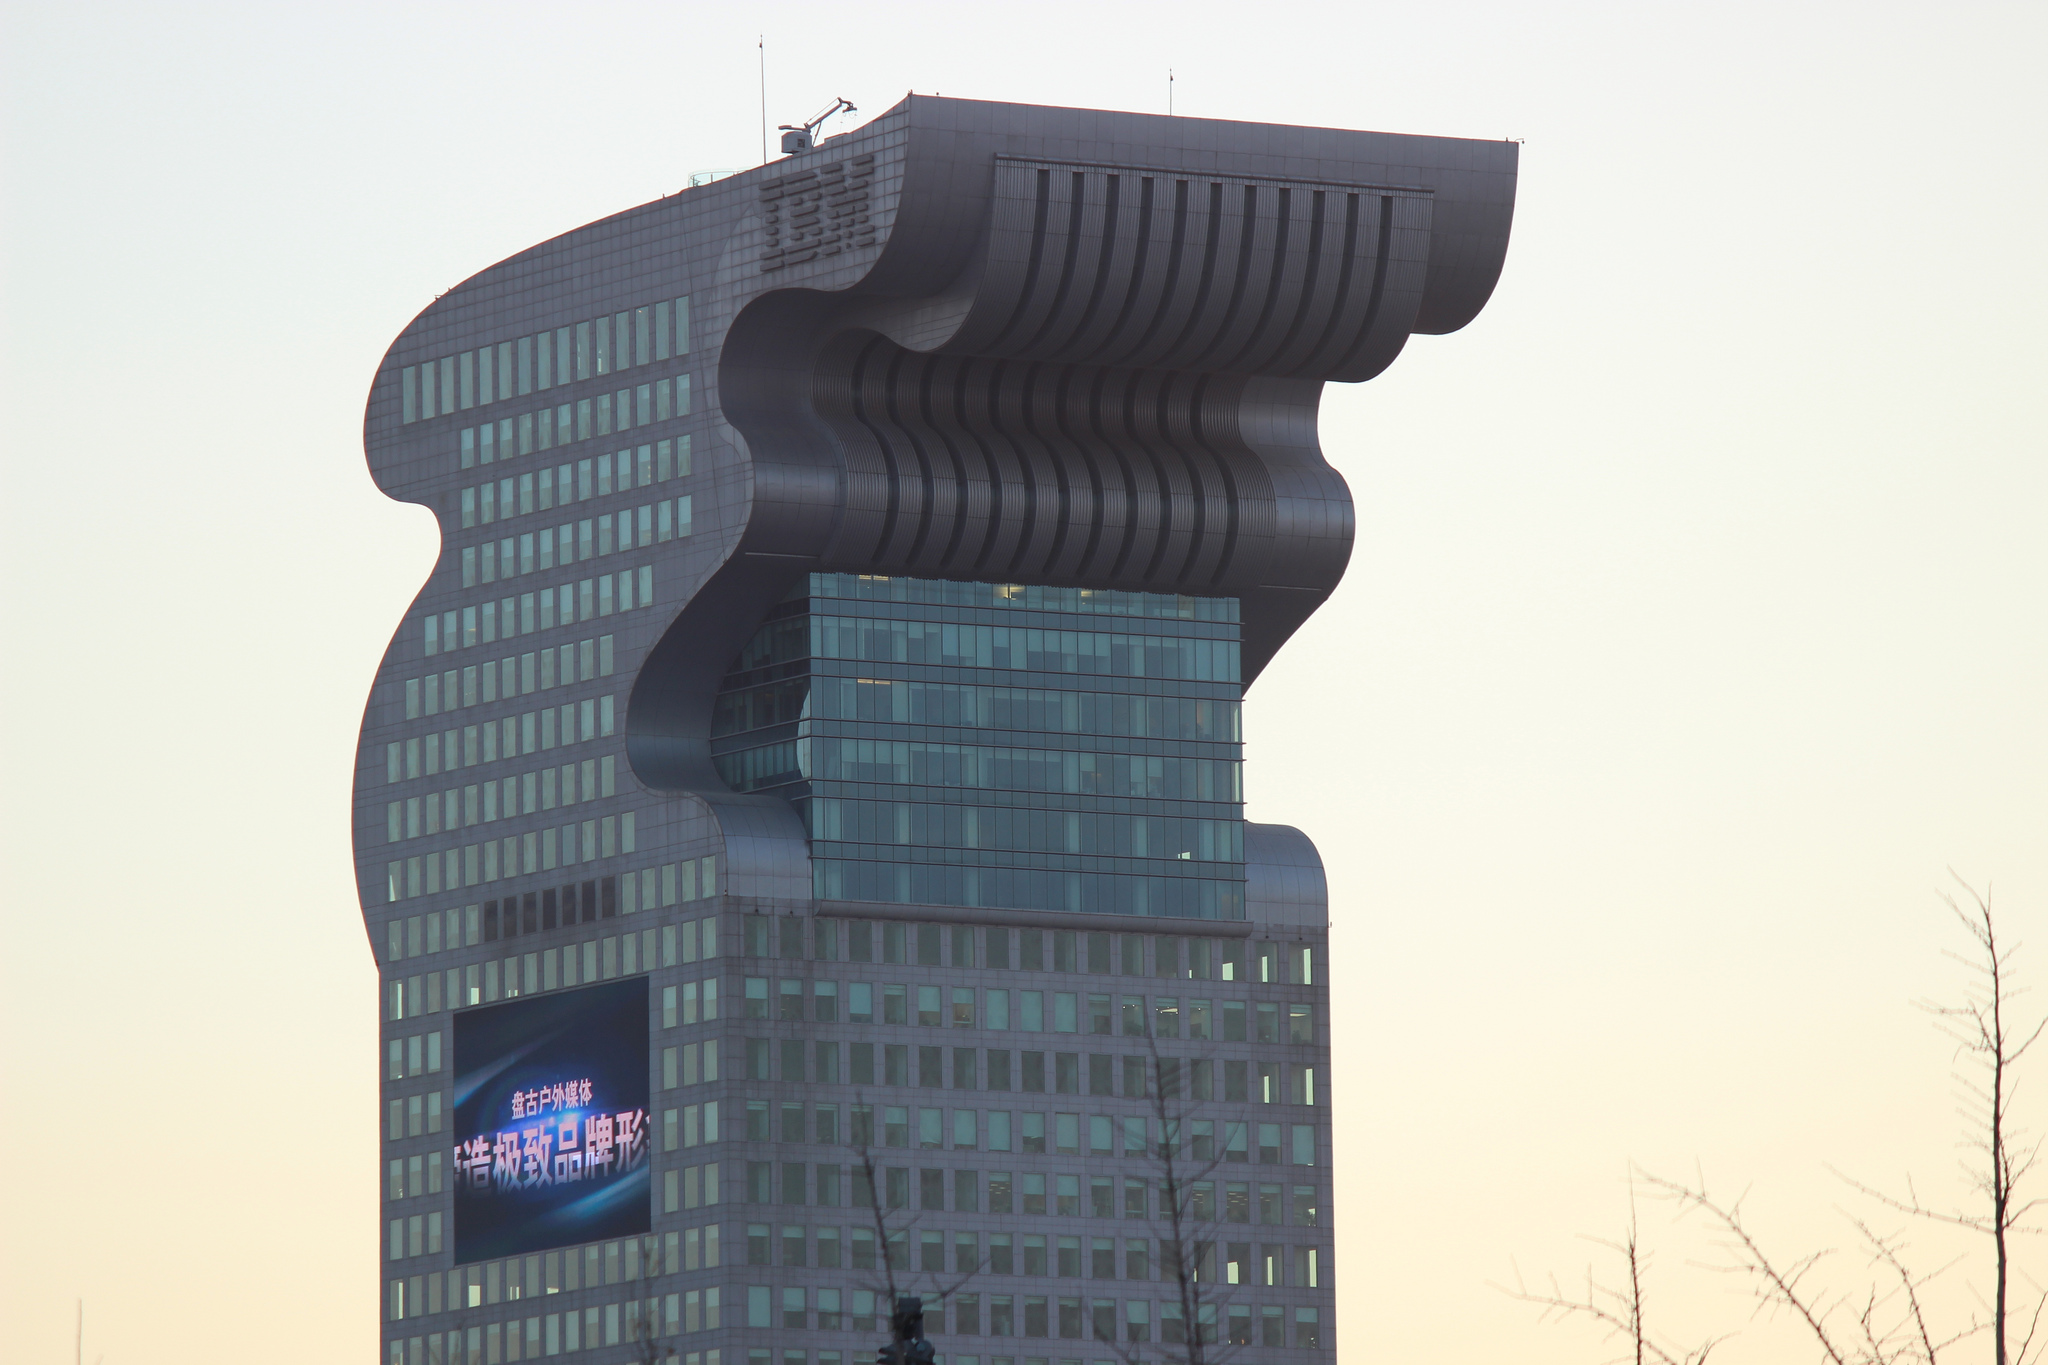 IBM Tower Beijing China edward stojakovic Flickr